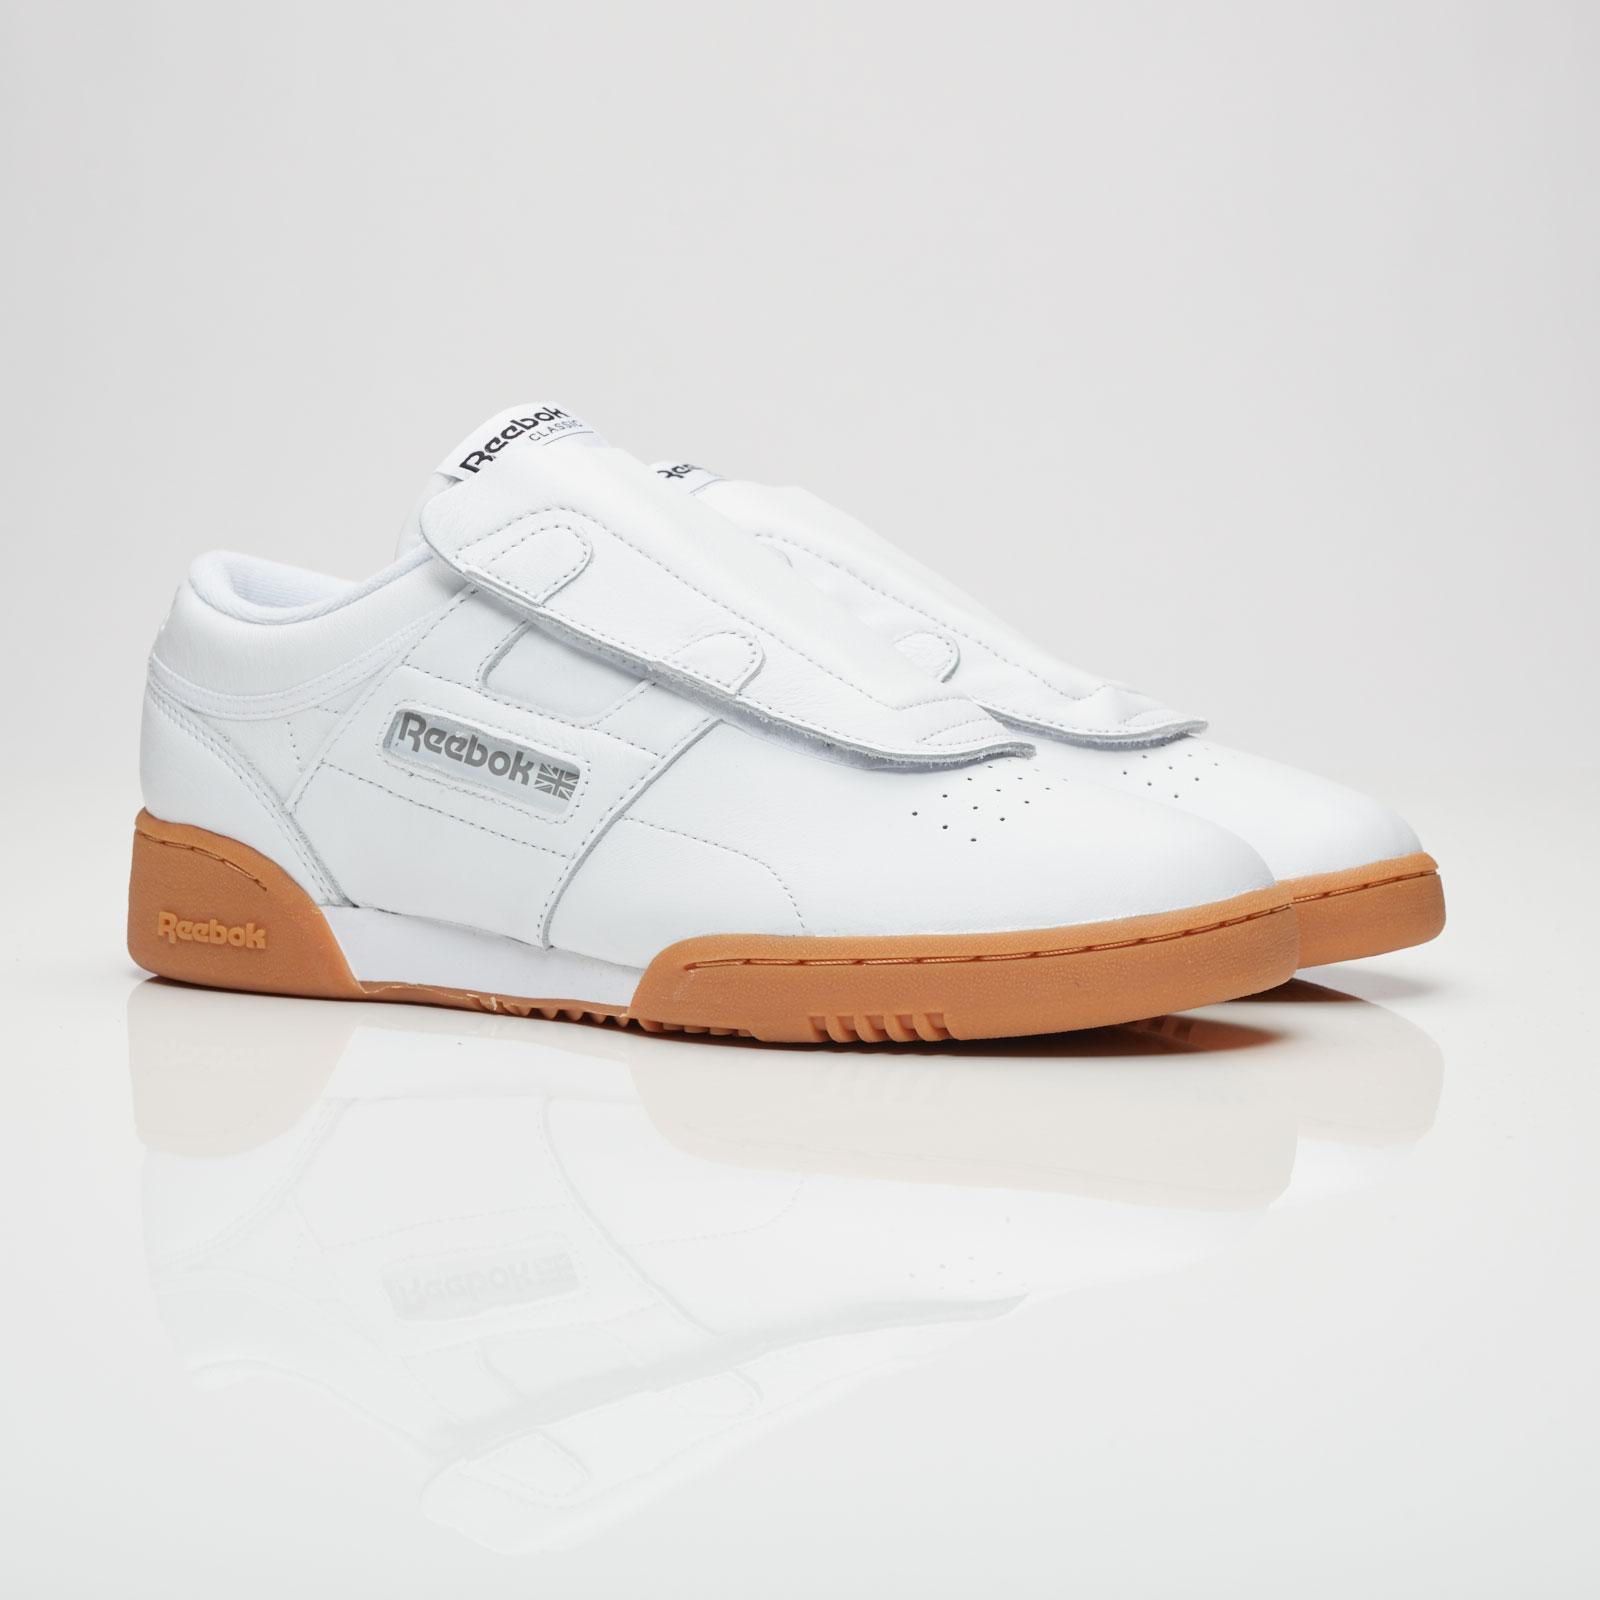 4381bccf2207 Reebok Beams X Workout Lo Clean - Bd5811 - Sneakersnstuff